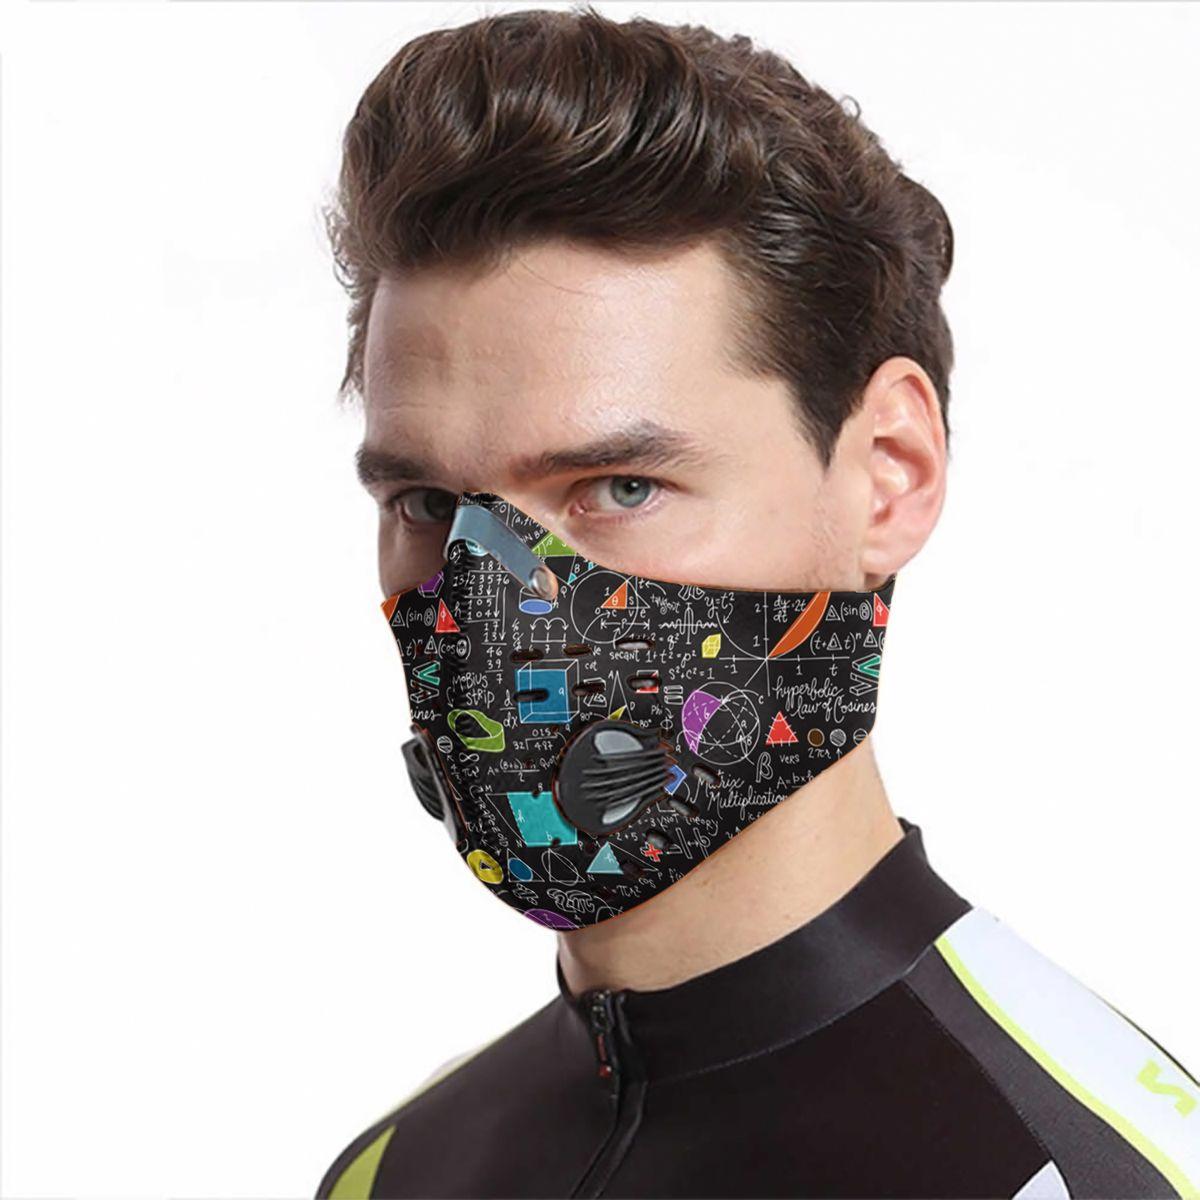 School math board carbon pm 2,5 face mask 4